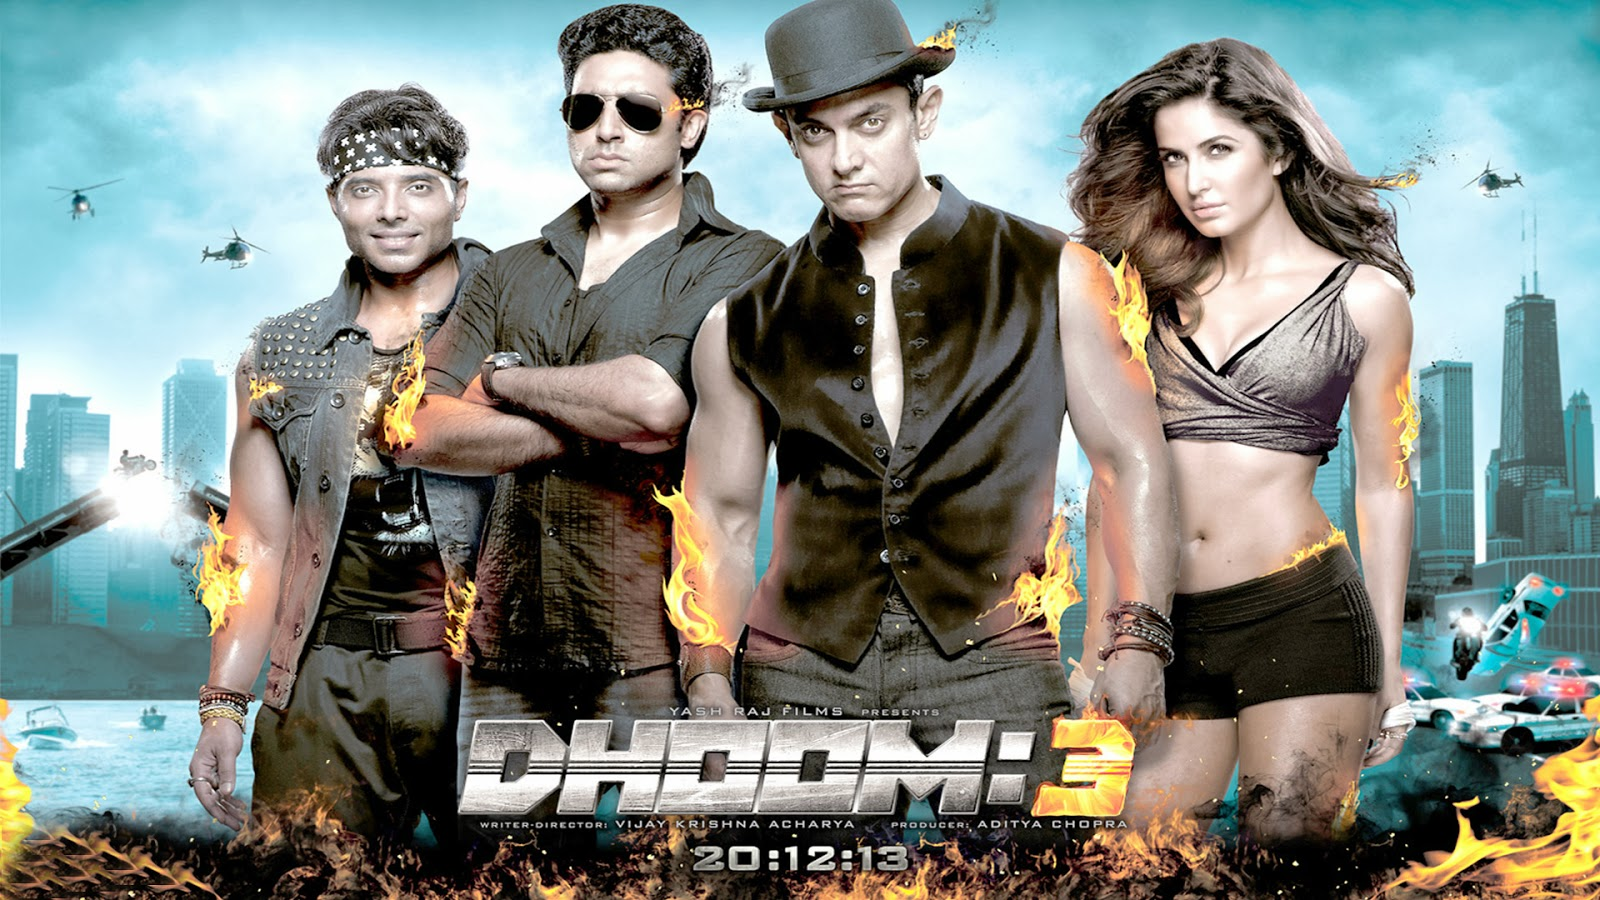 doom 1 full movie free download